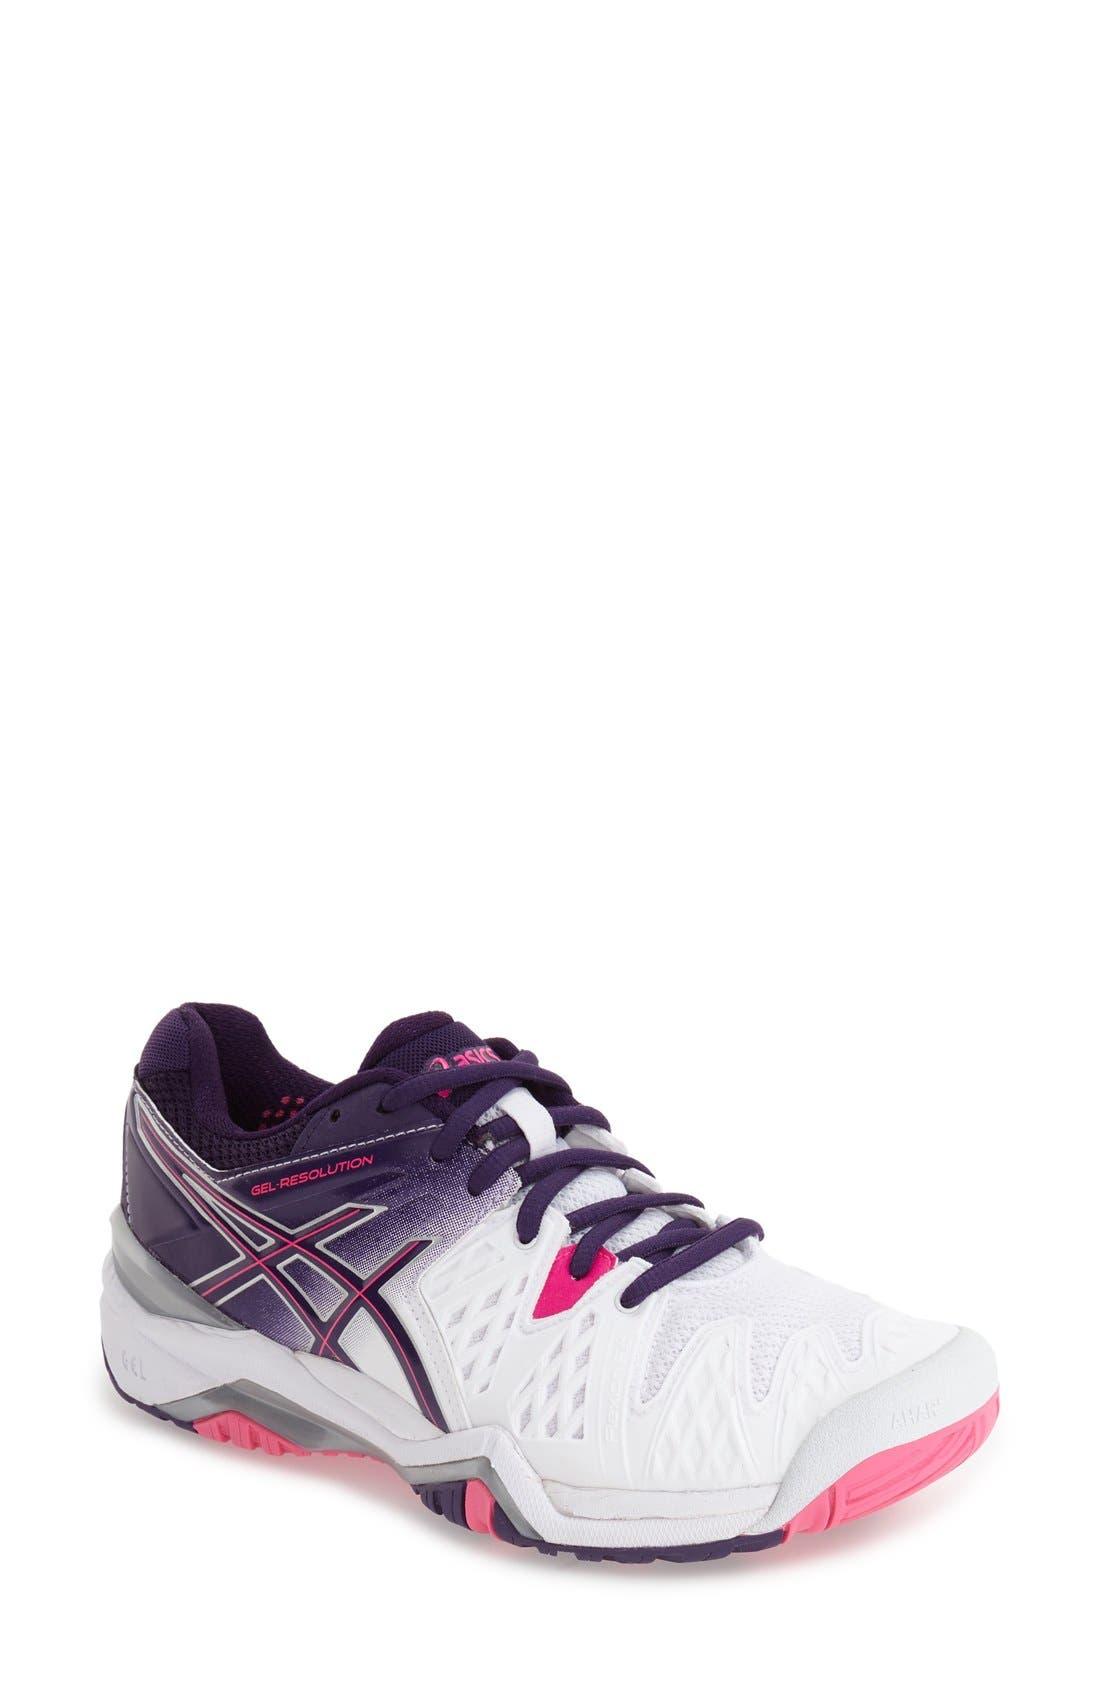 Alternate Image 1 Selected - ASICS® 'GEL-Resolution 5' Tennis Shoe (Women)